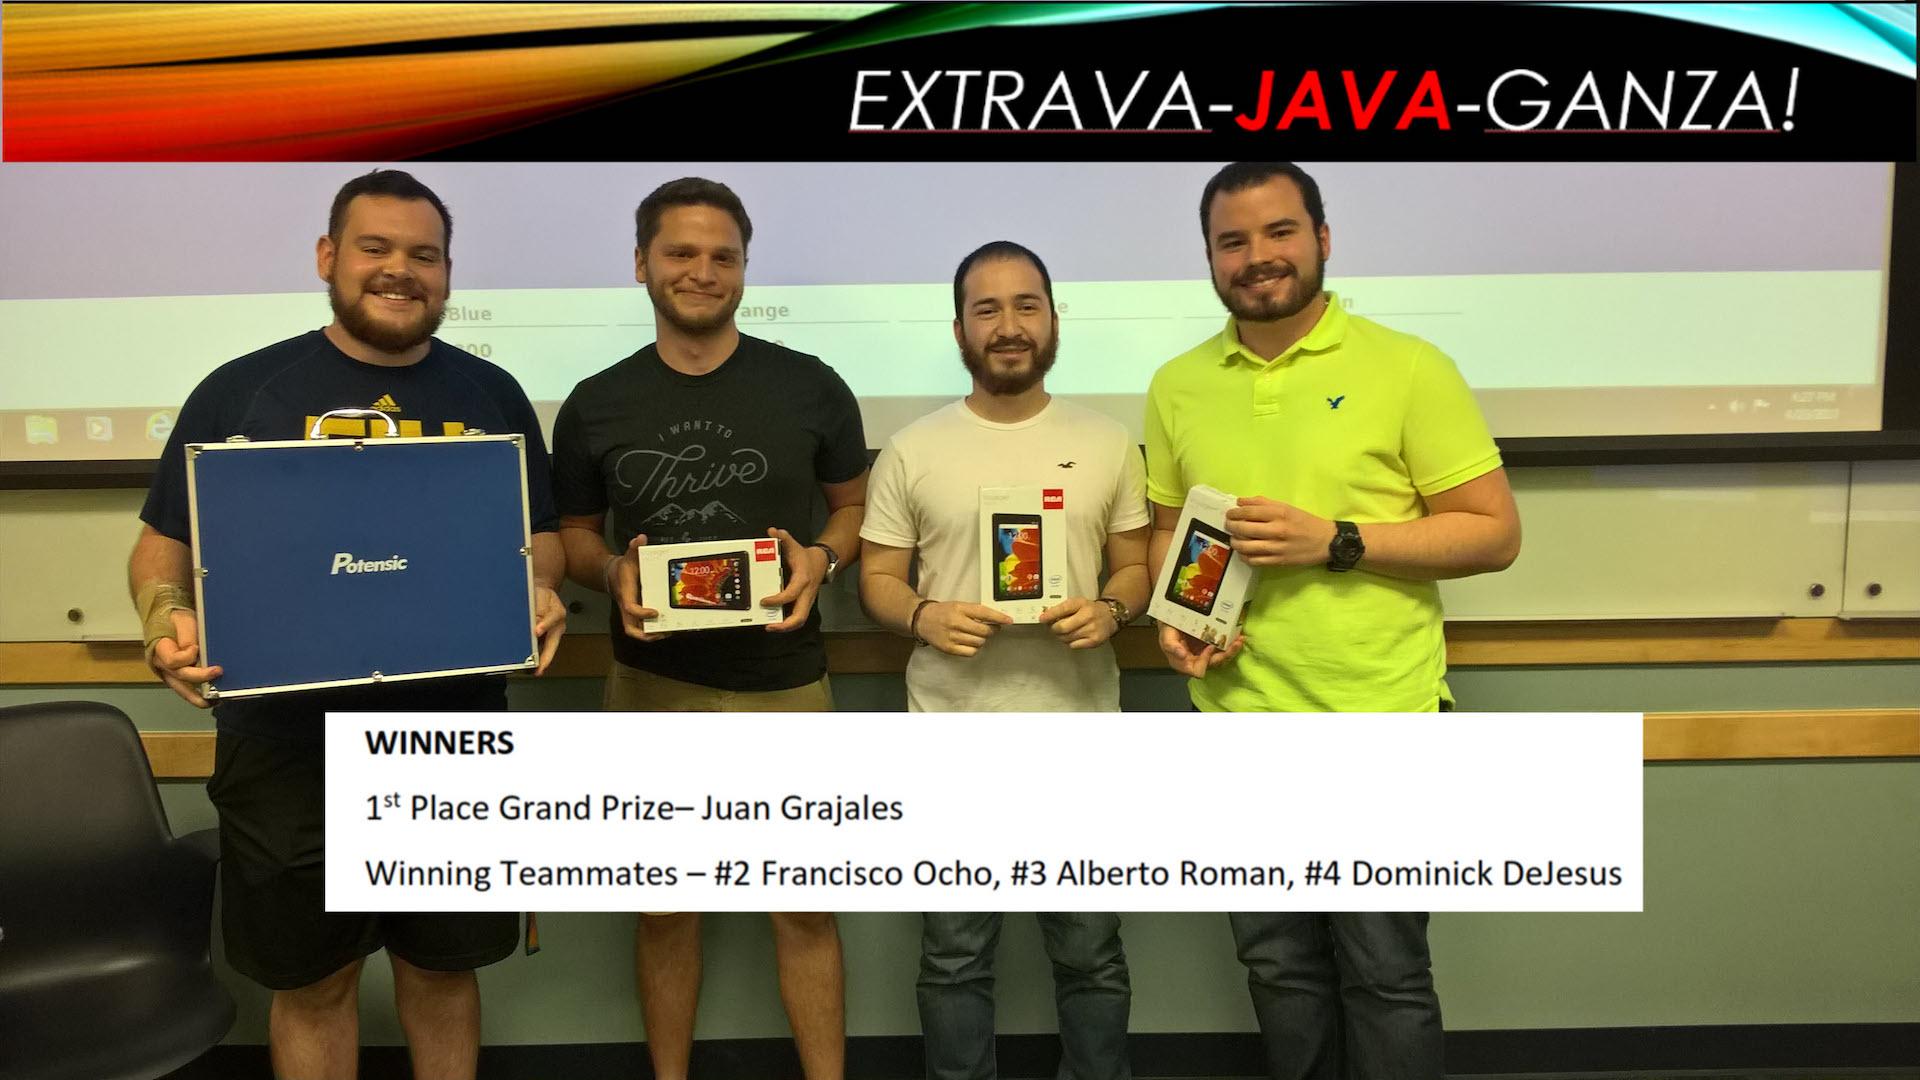 Extrava Java Ganza winners poster